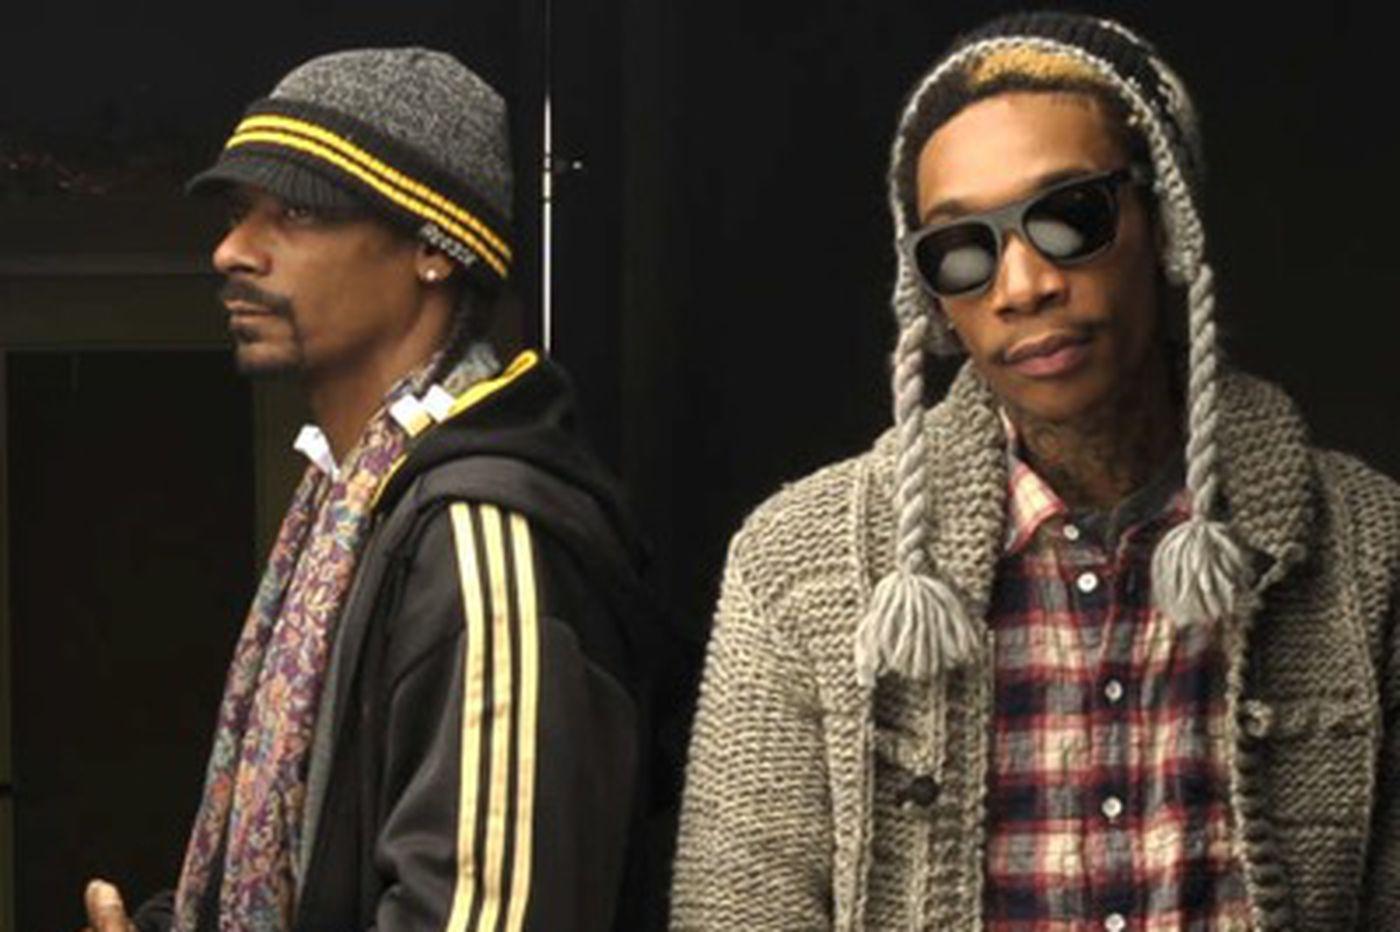 Snoop, Khalifa blaze the homage trail with stoner album, flick